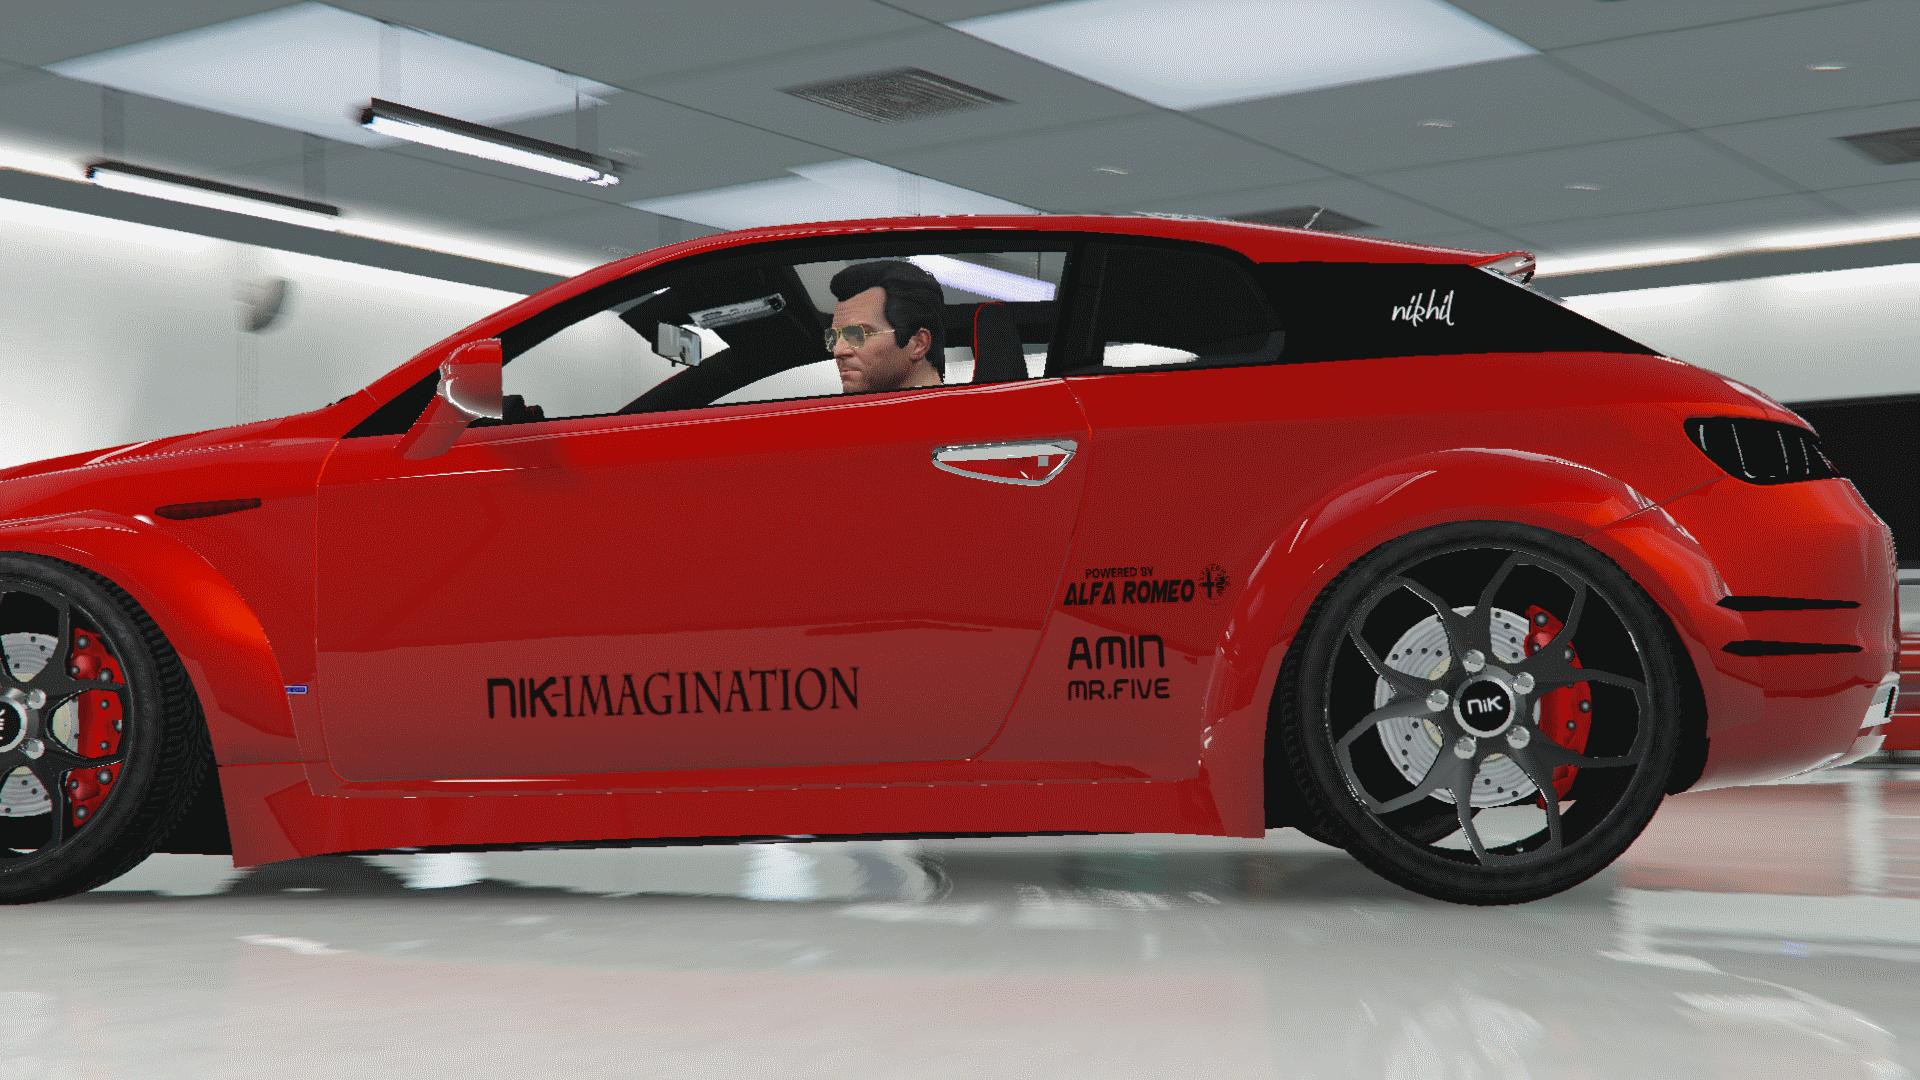 Alfa Romeo Brera Custom Vehicules Pour Gta V Sur Gta Modding